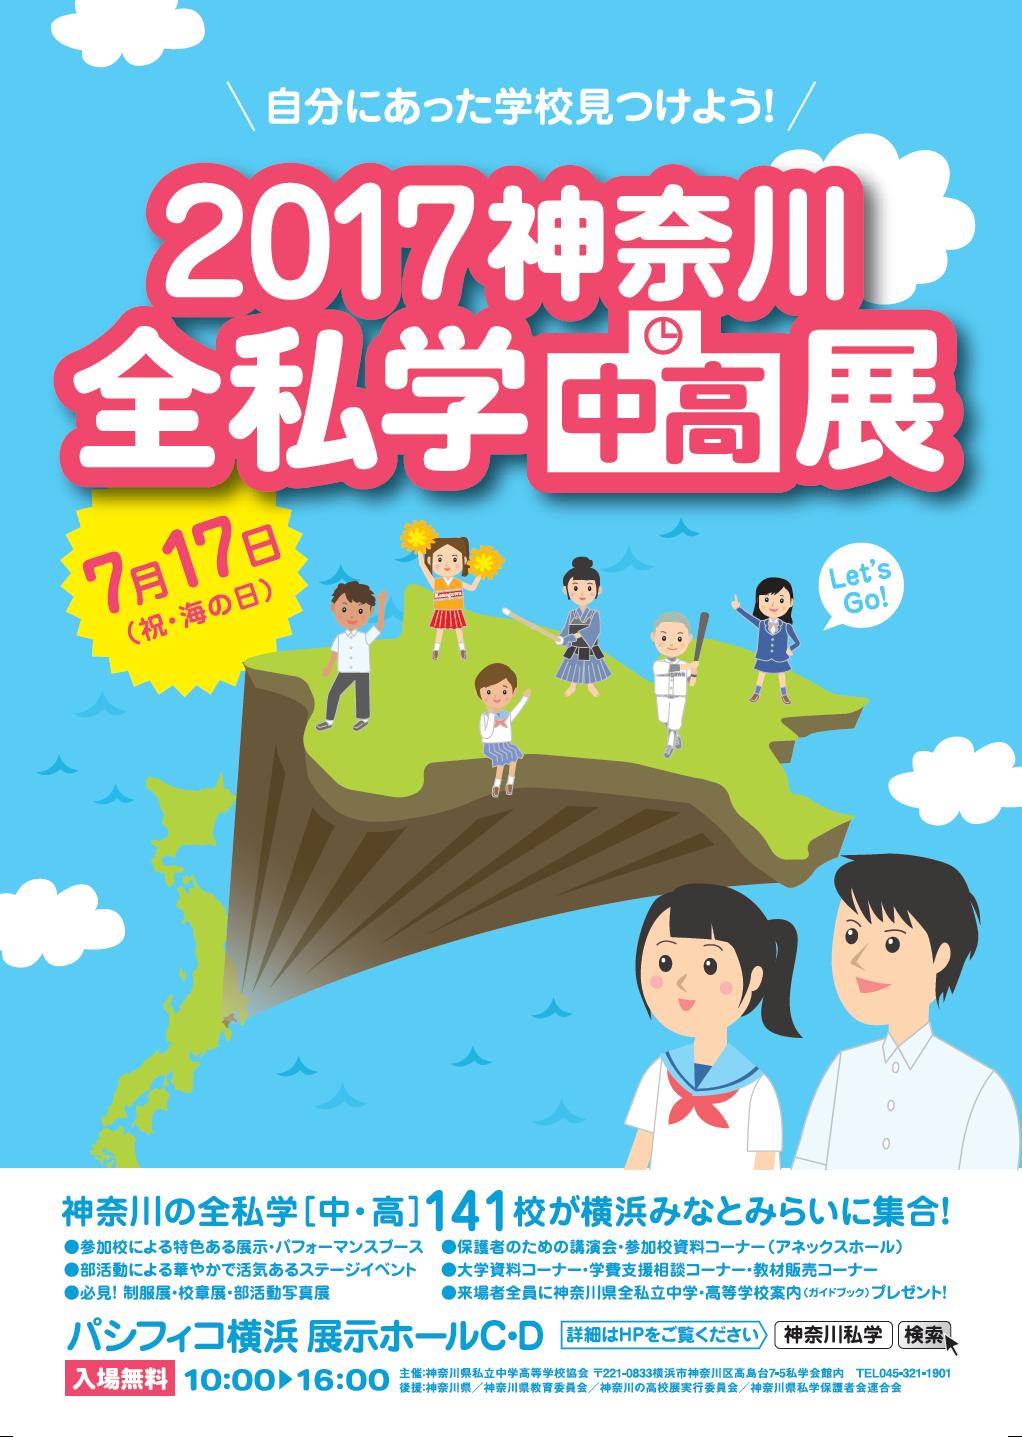 http://www.zushi-kaisei.ac.jp/news/fc5001ccb3fec9e971183b1ab9656228842584cf.png